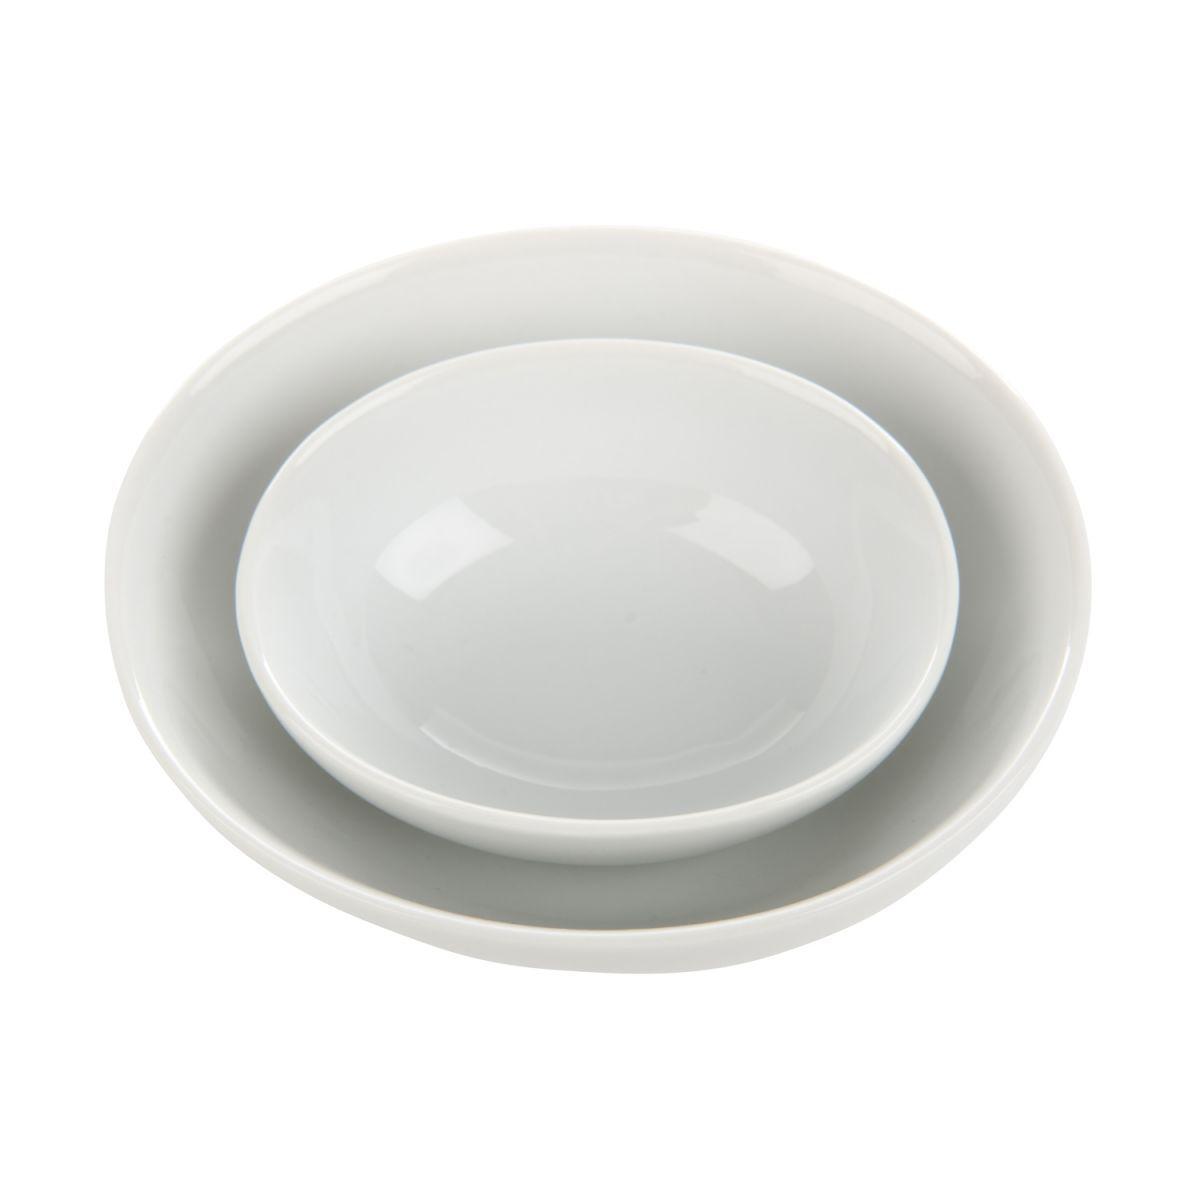 bowl oval 9 x 7 cm box6